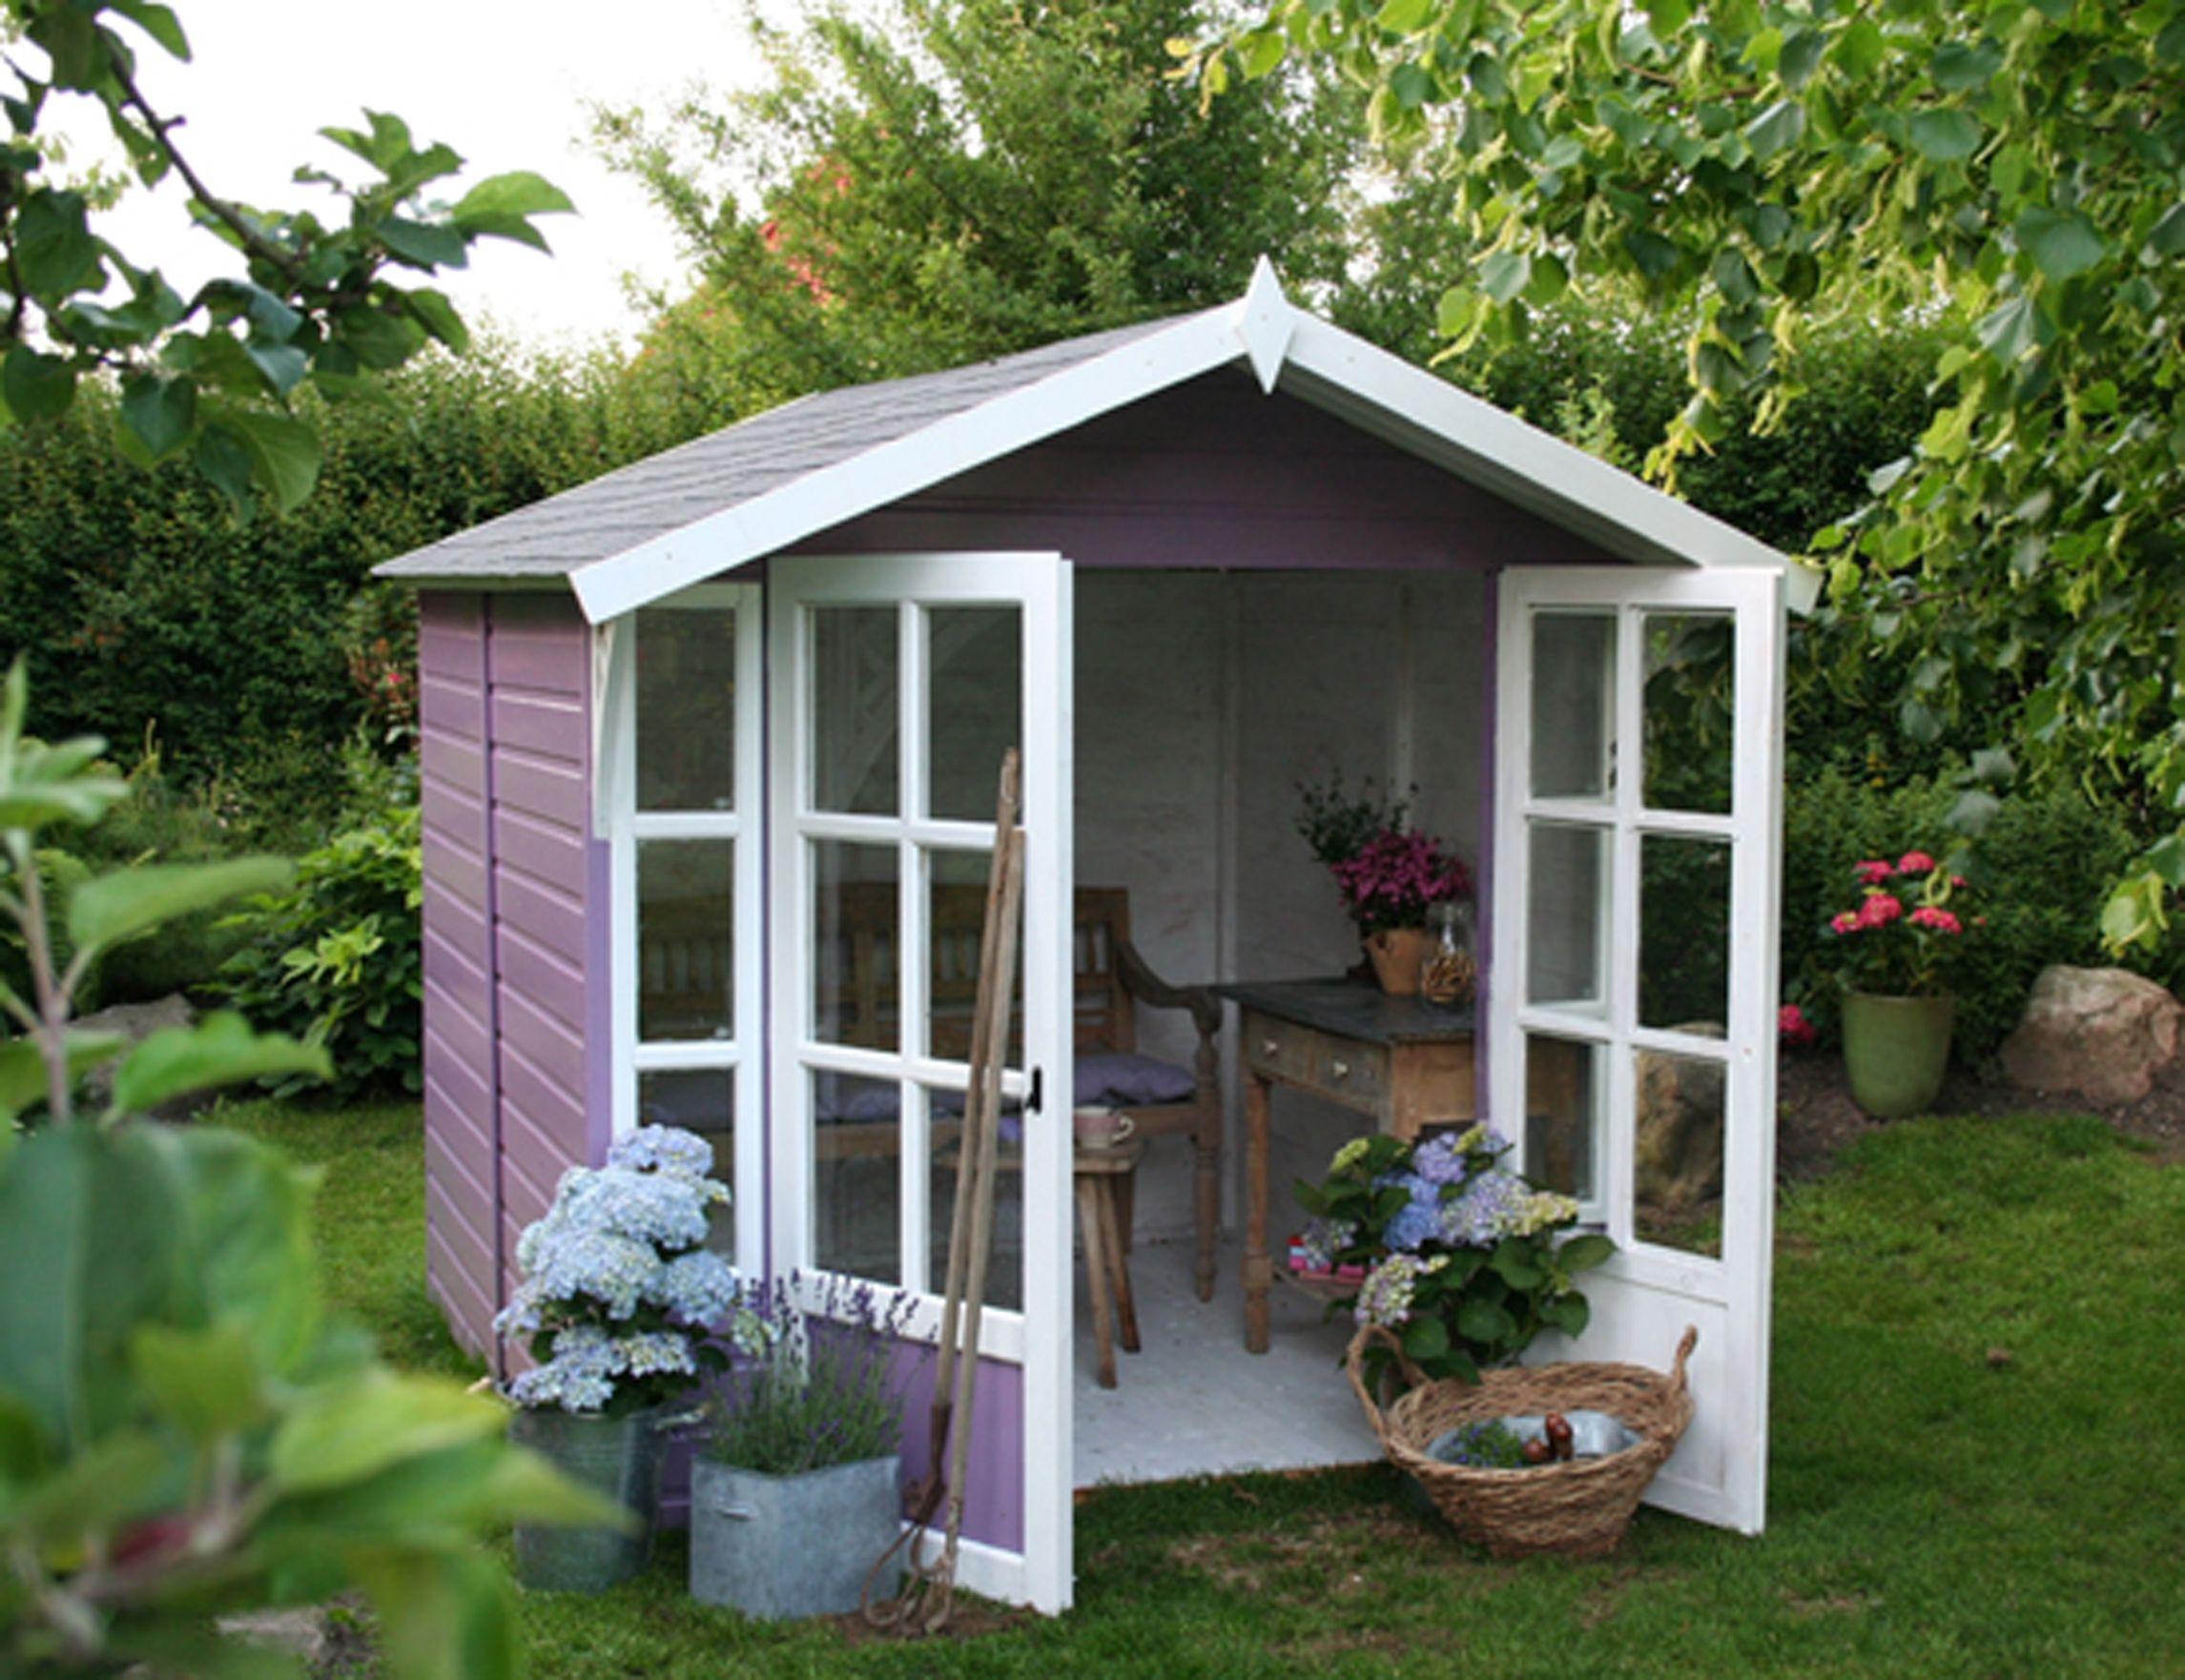 Gartenhaus Modell Clara Mit Offener Tur Haus Gartenhaus Garten